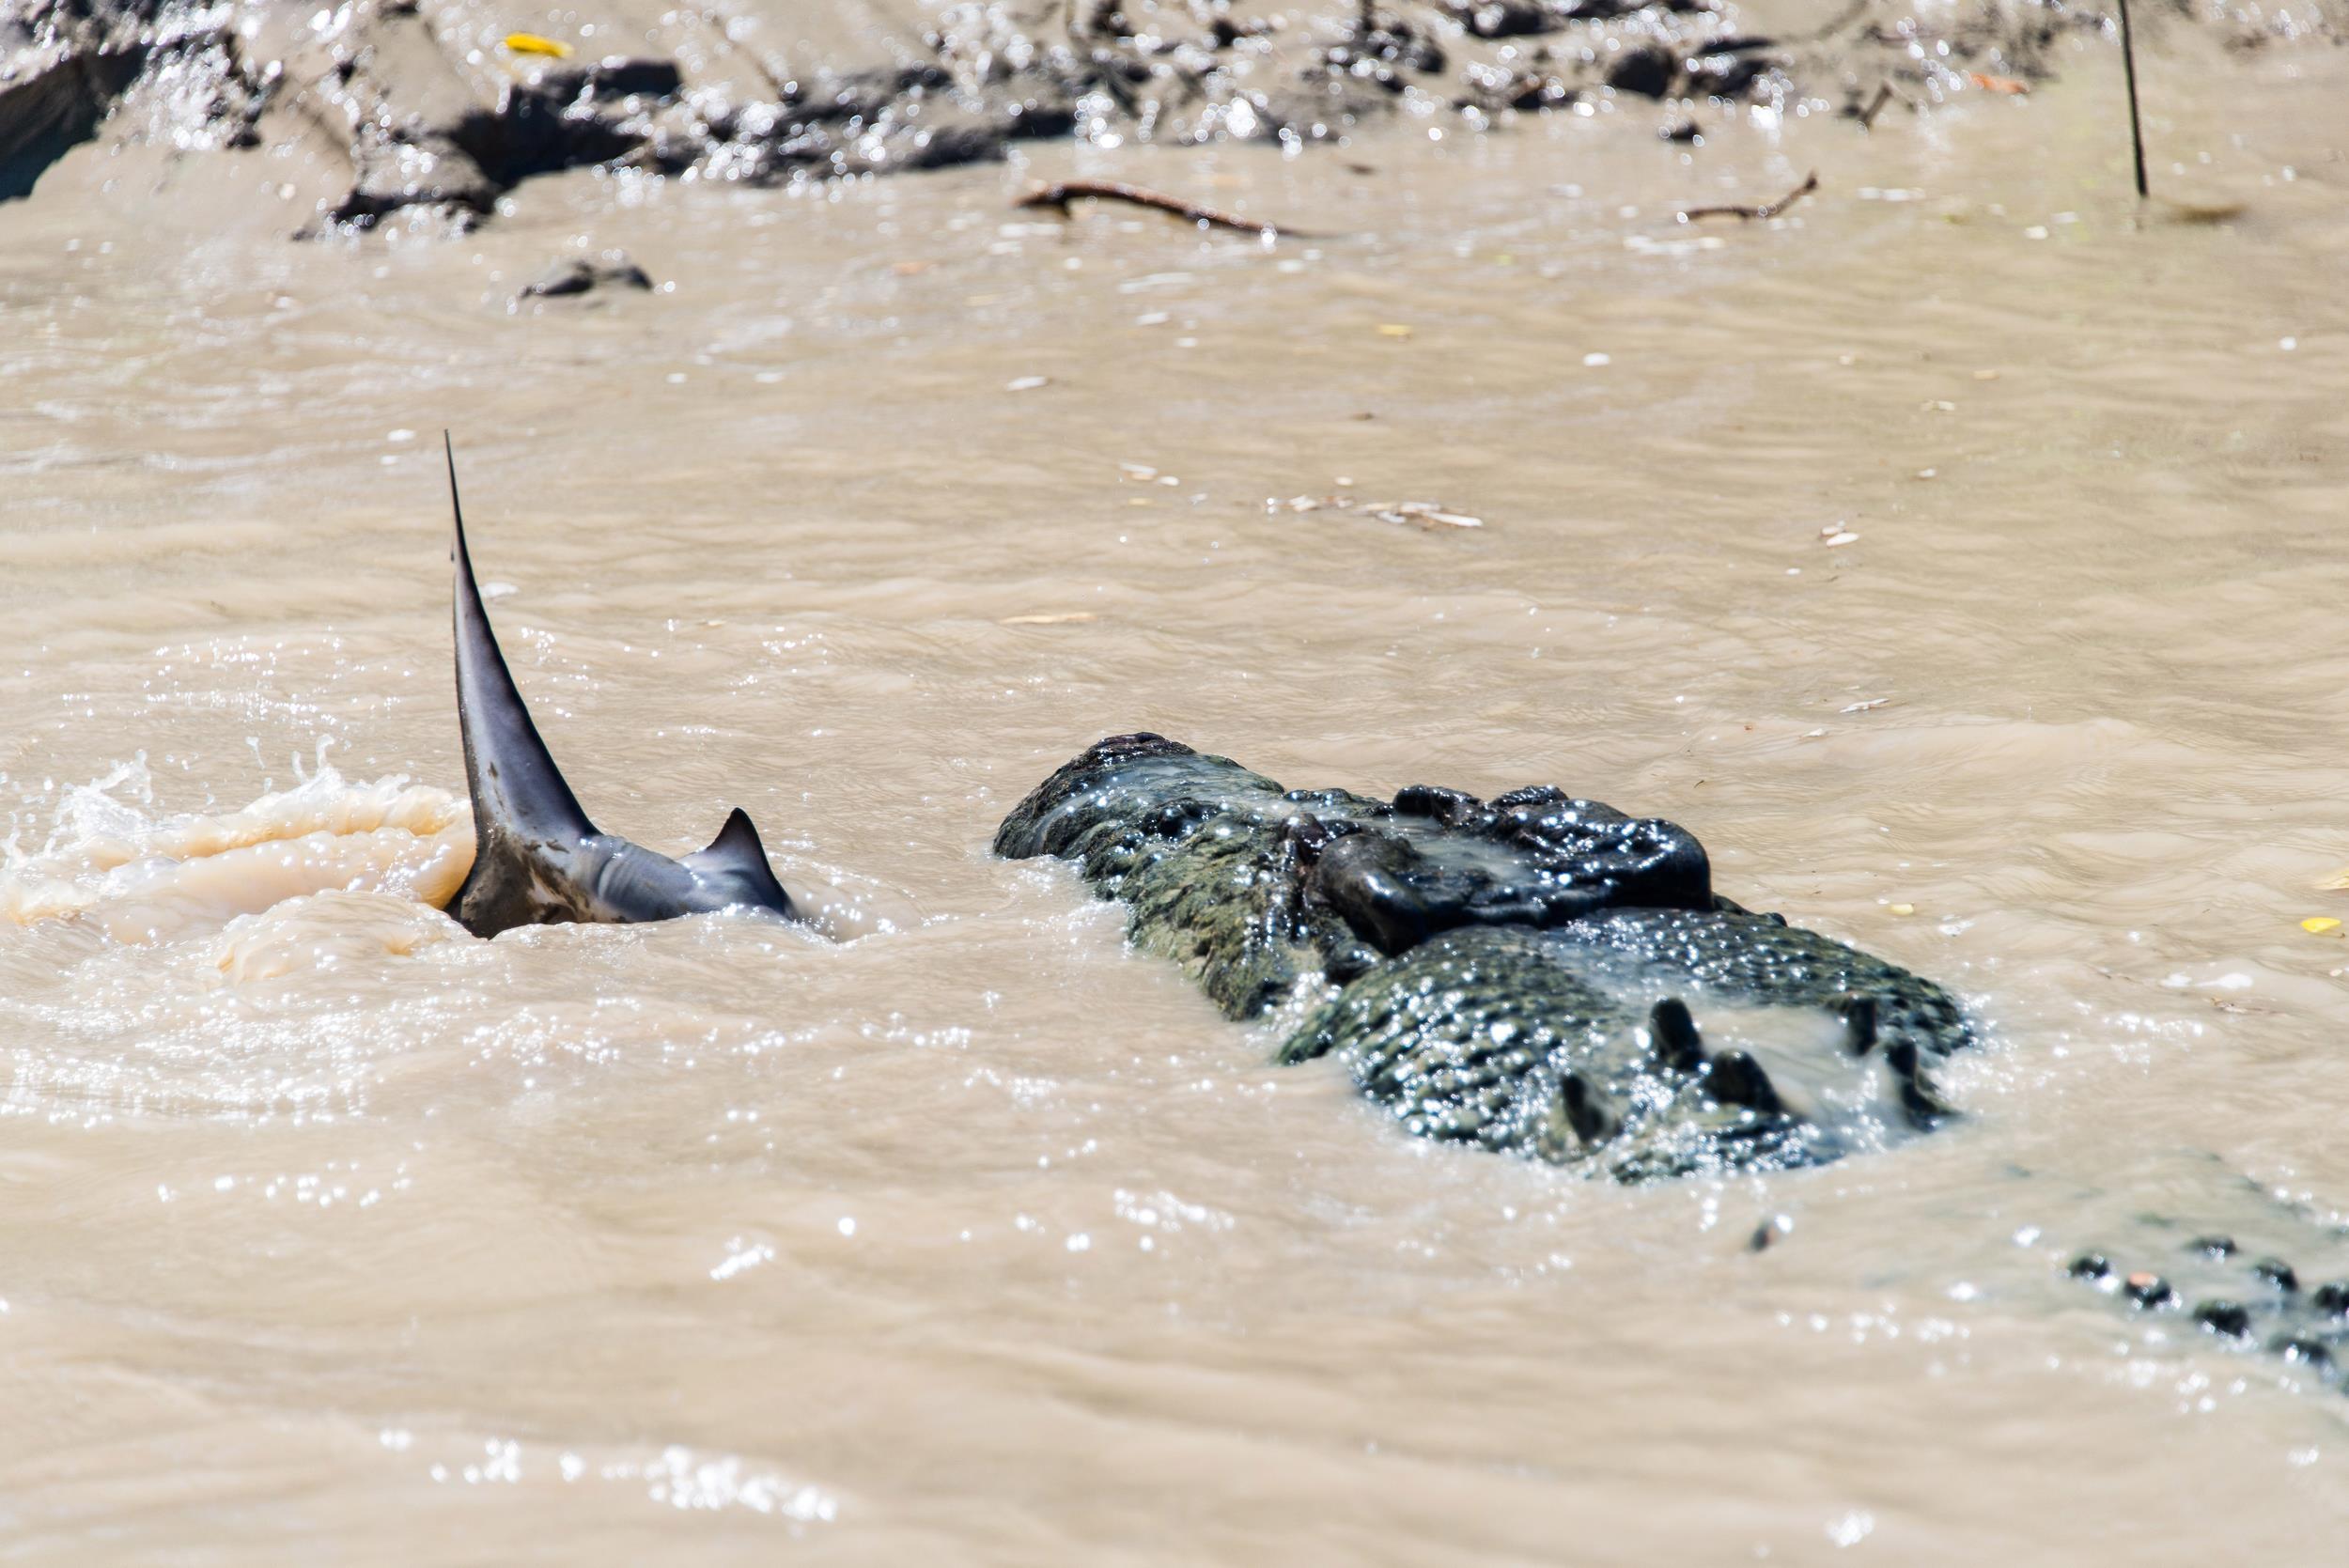 Alligator vs shark attacks - photo#7